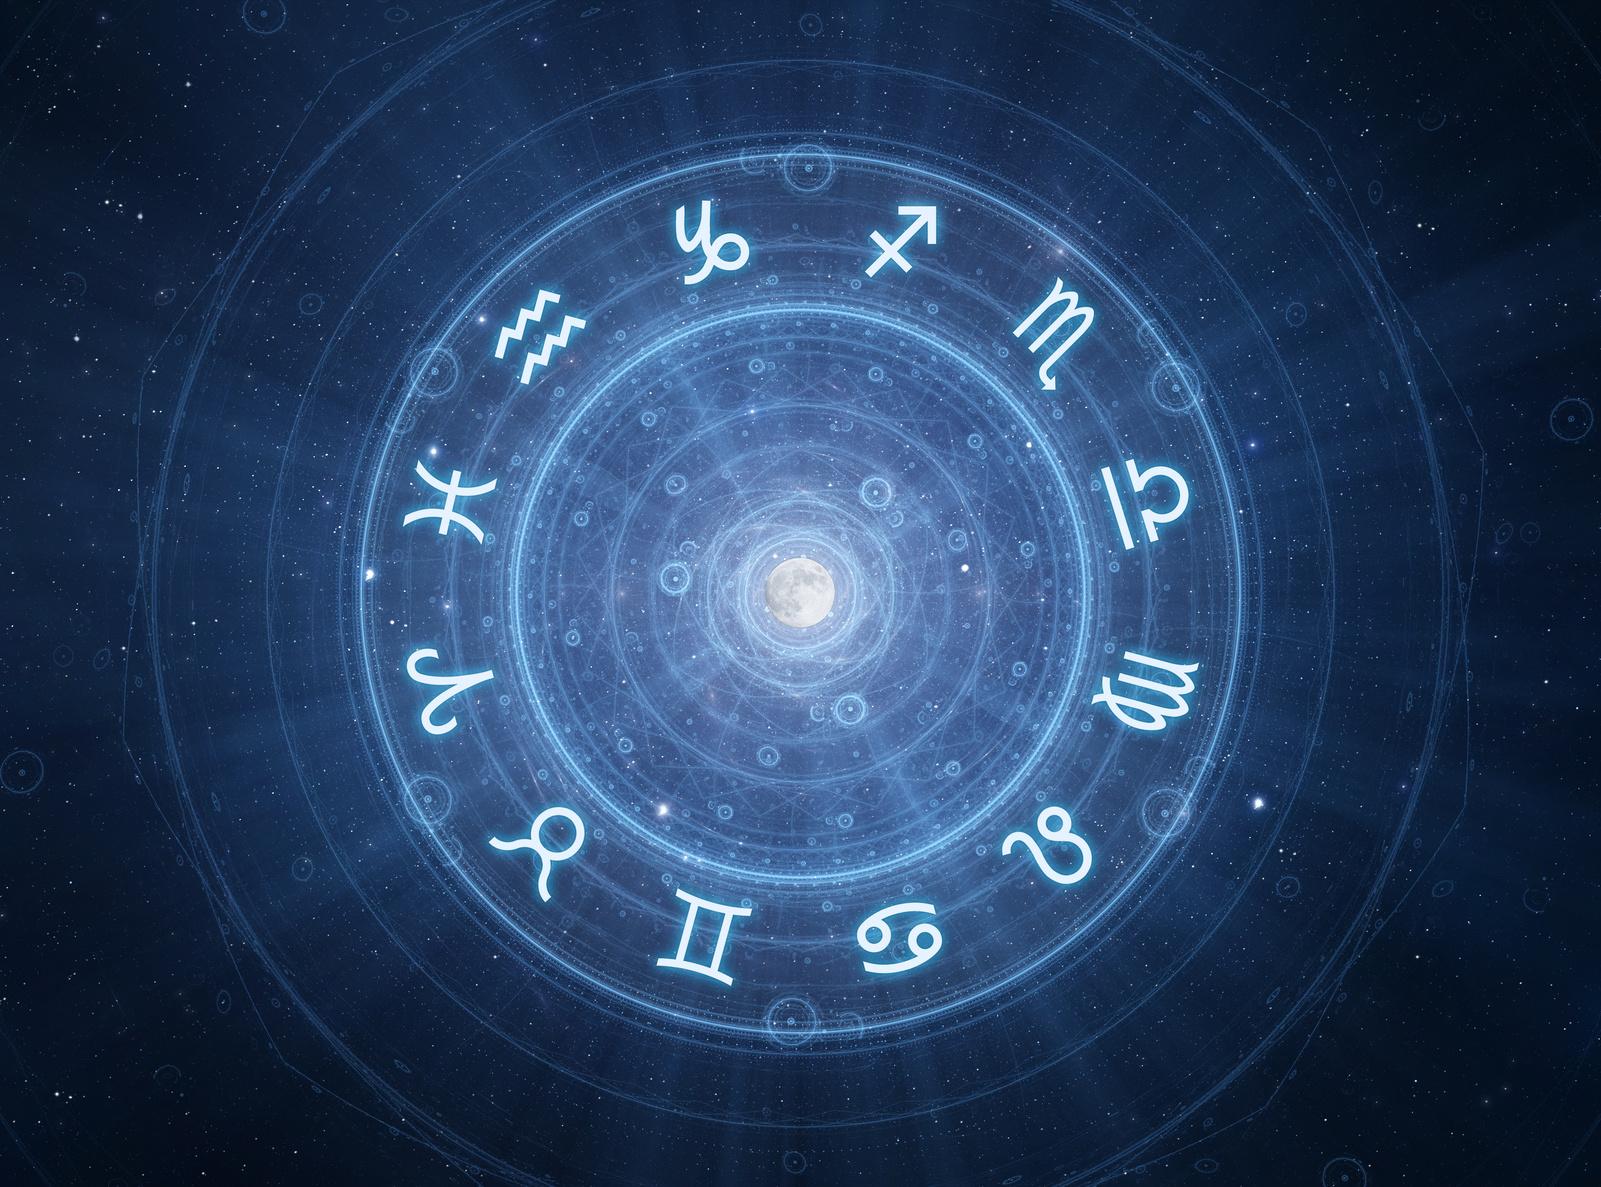 Zodiac Signs Horoscope symbols